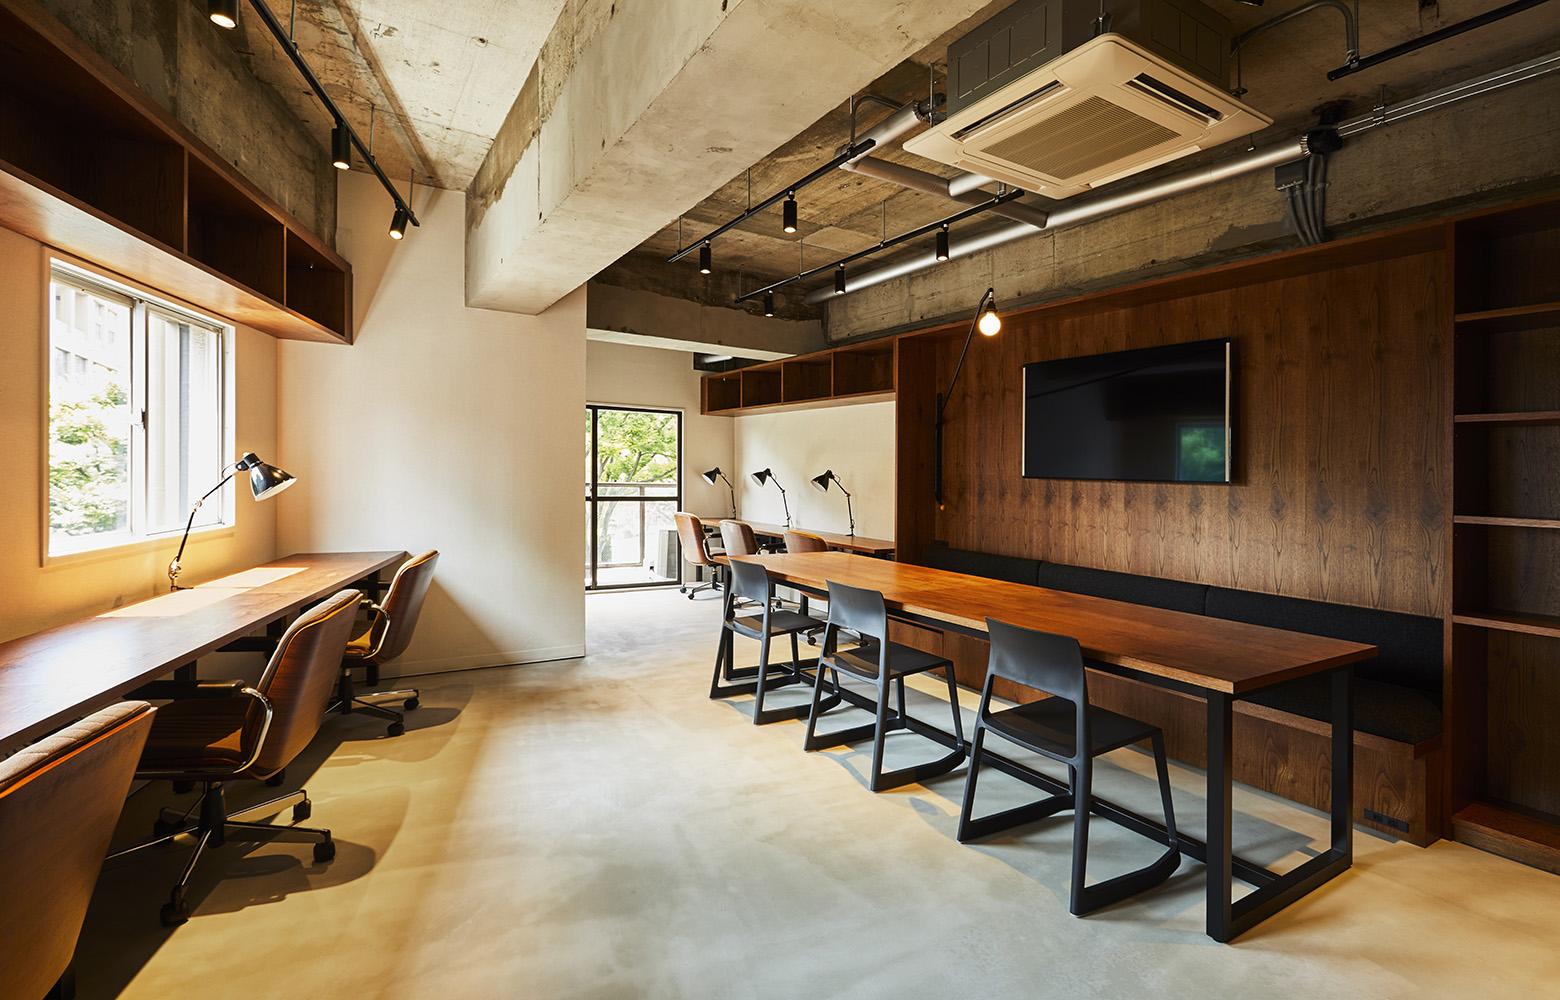 Quebico株式会社 Work Space デザイン・レイアウト事例